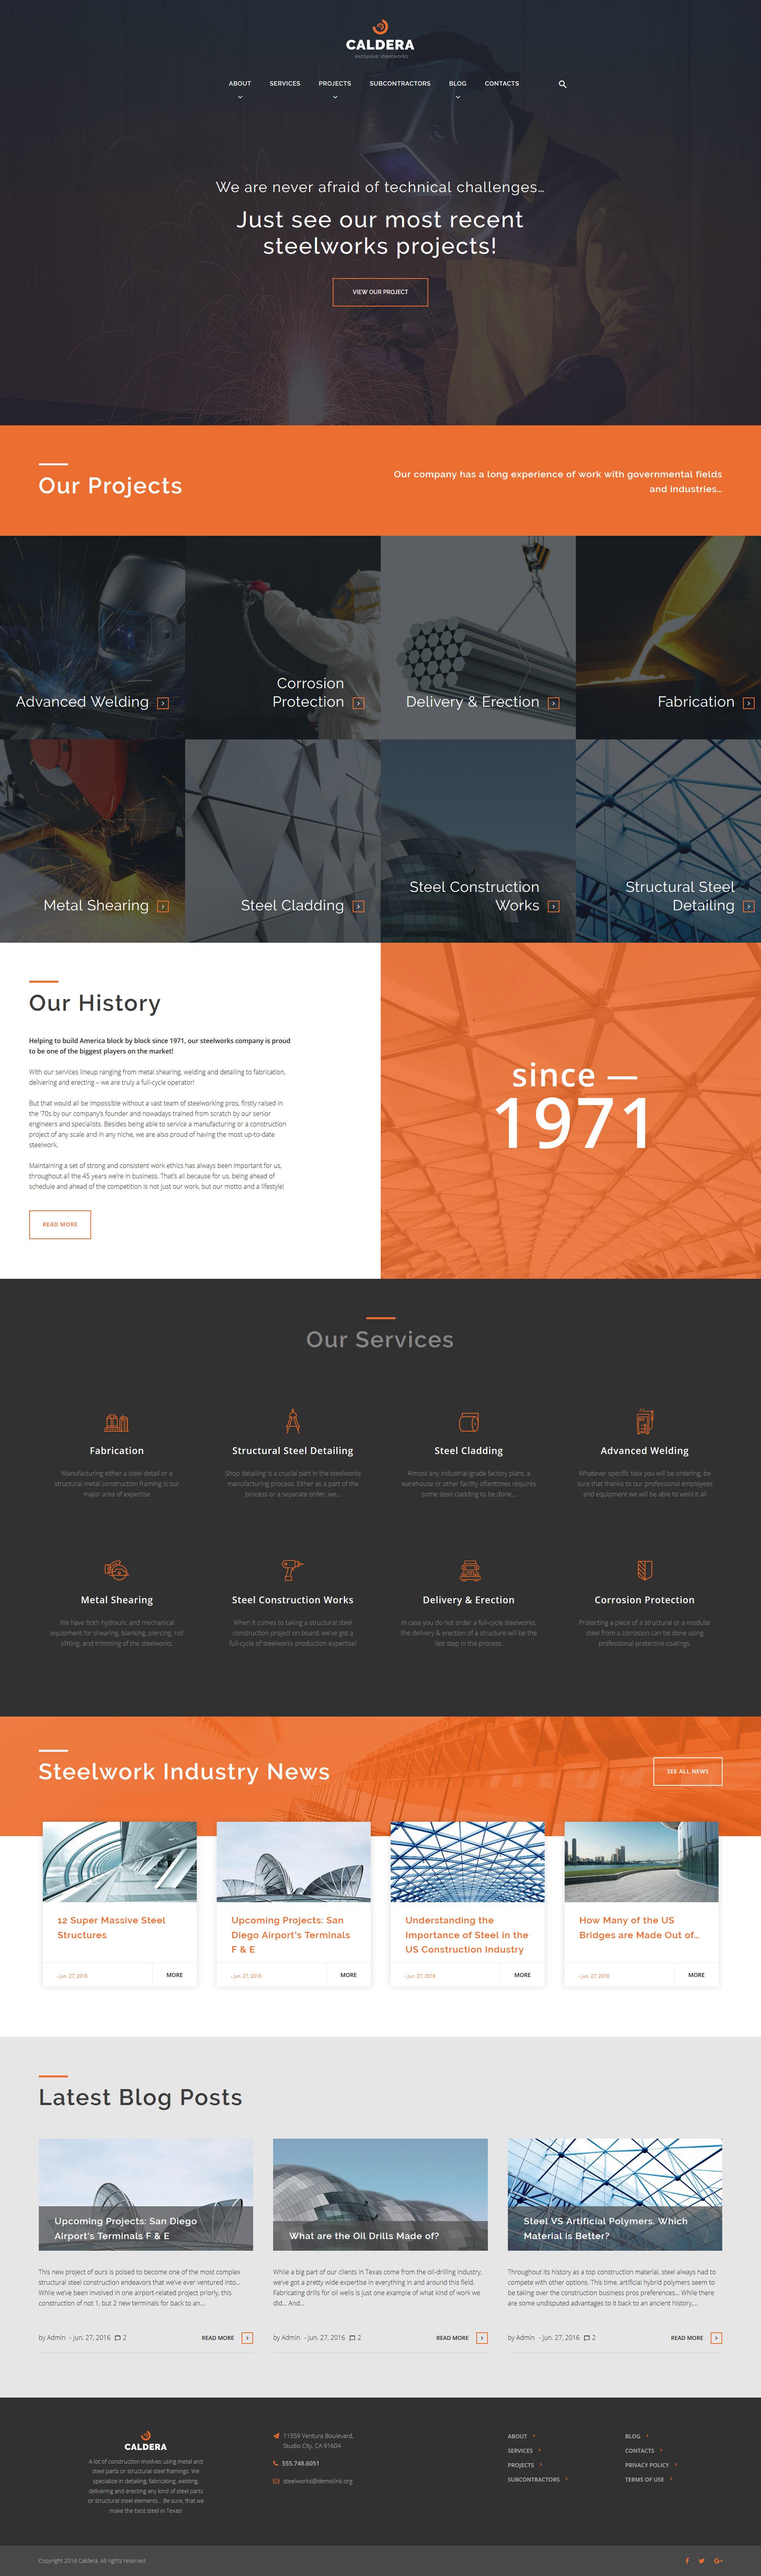 "WordPress Theme namens ""Caldera - Steelworks and Constructions"" #59027"